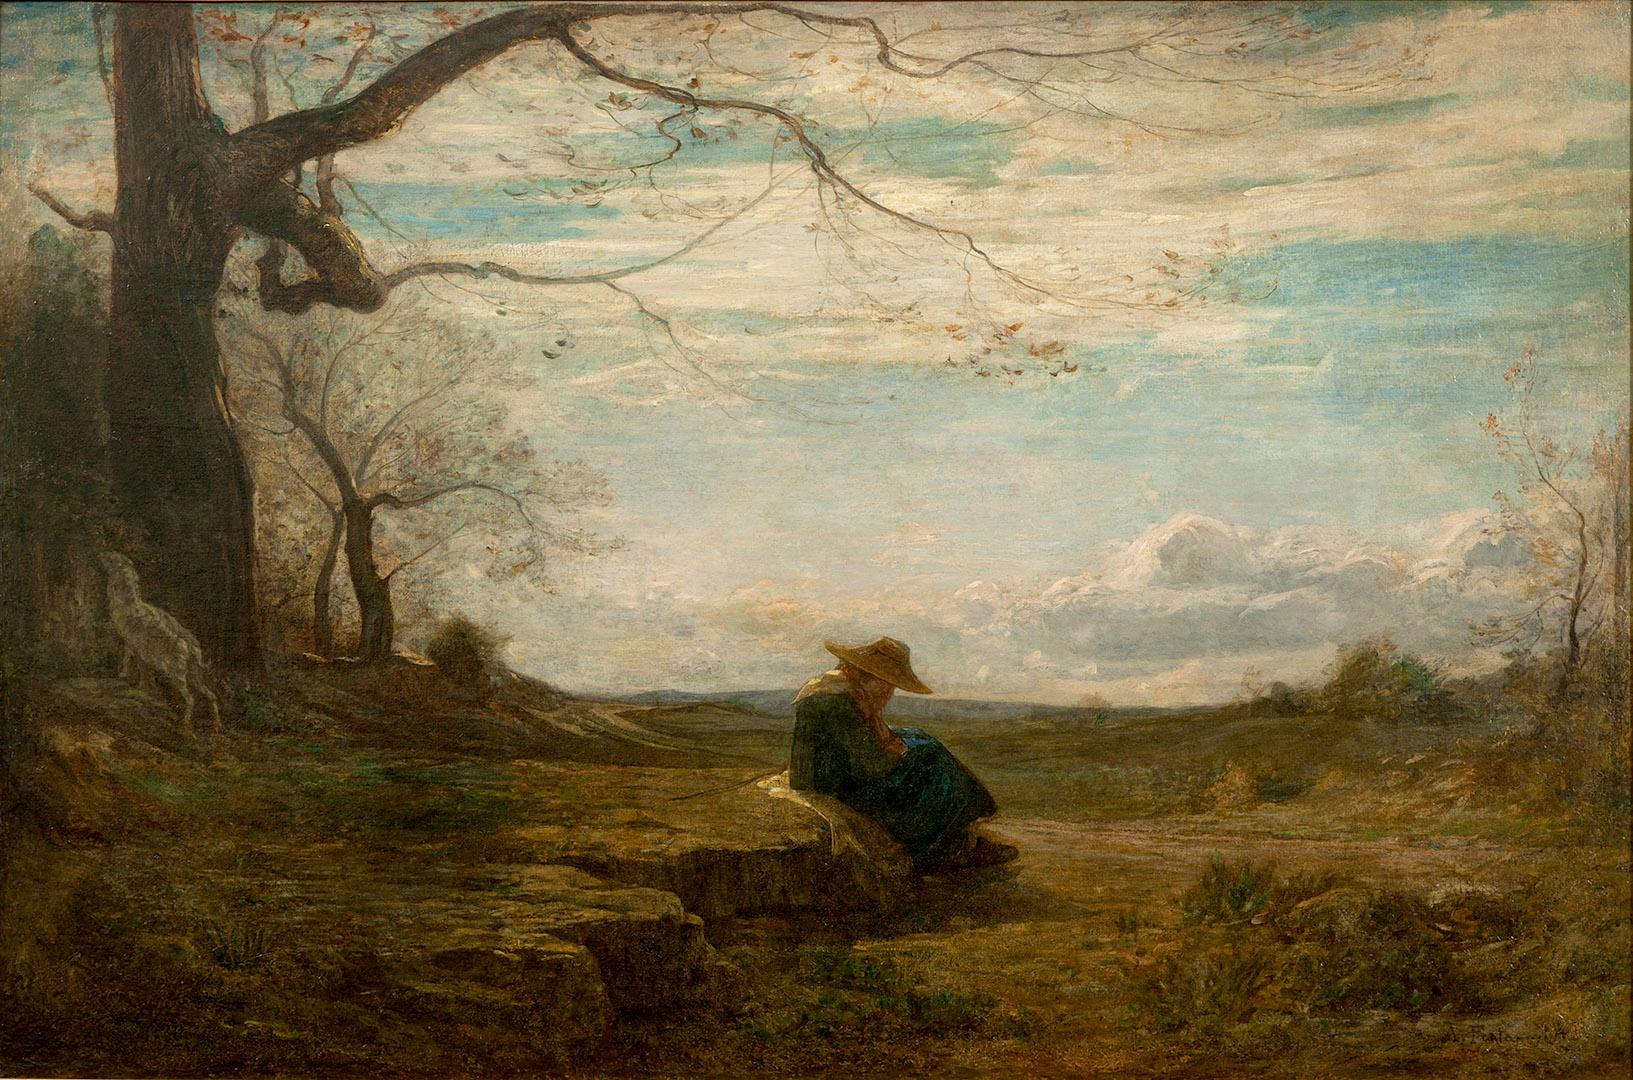 Antonio Fontanesi, Novembre (1864; olio su tela, 103 x 153 cm; Torino, GAM - Galleria Civica d'Arte Moderna e Contemporanea)